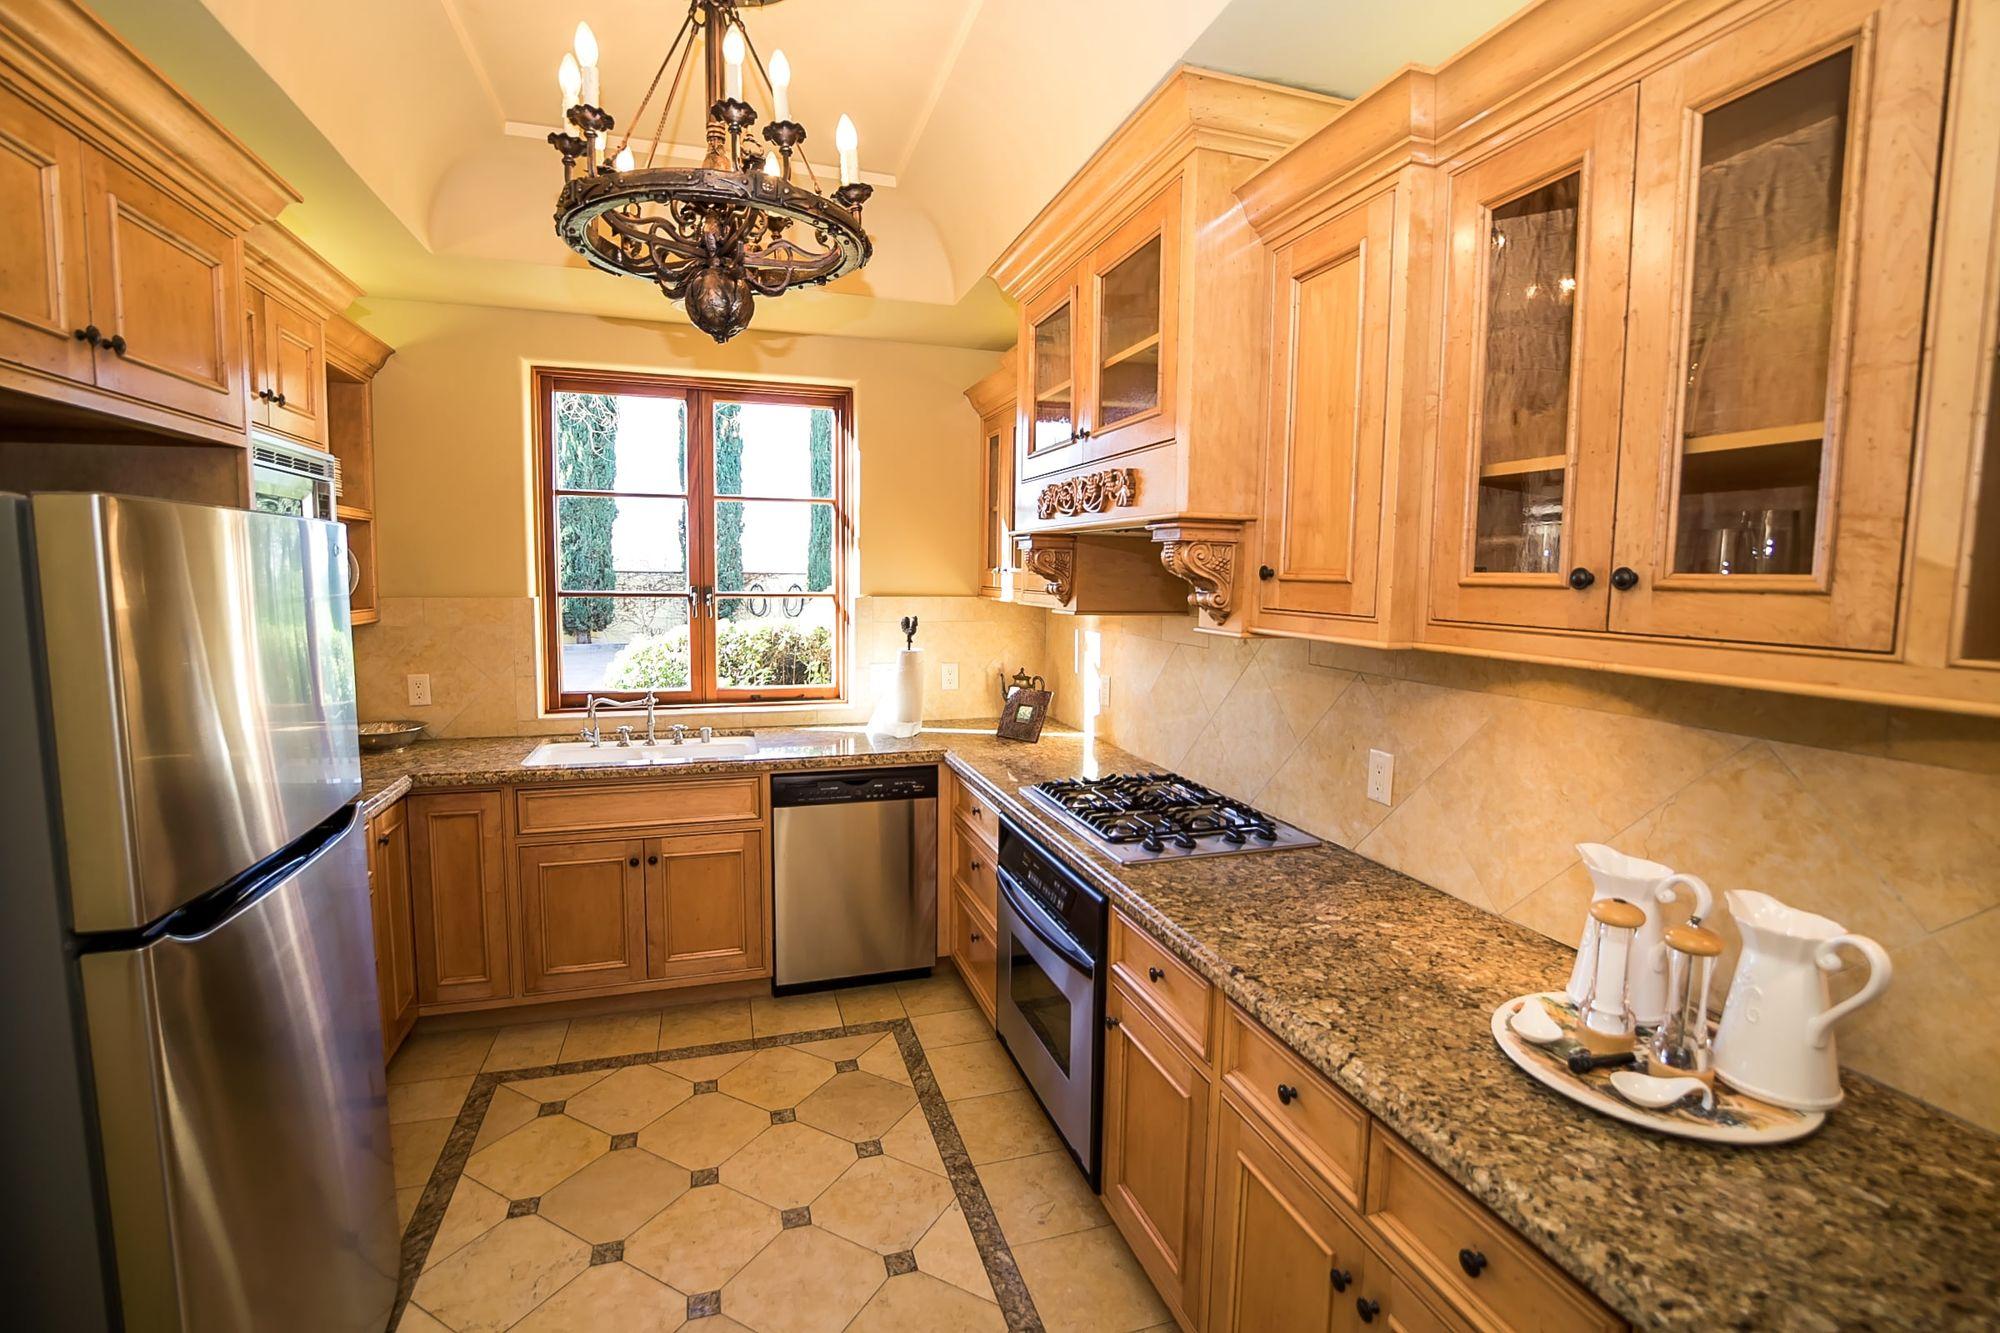 Kitchen with a chandelier, granite countertops, fridge, gas range, and sink under the window